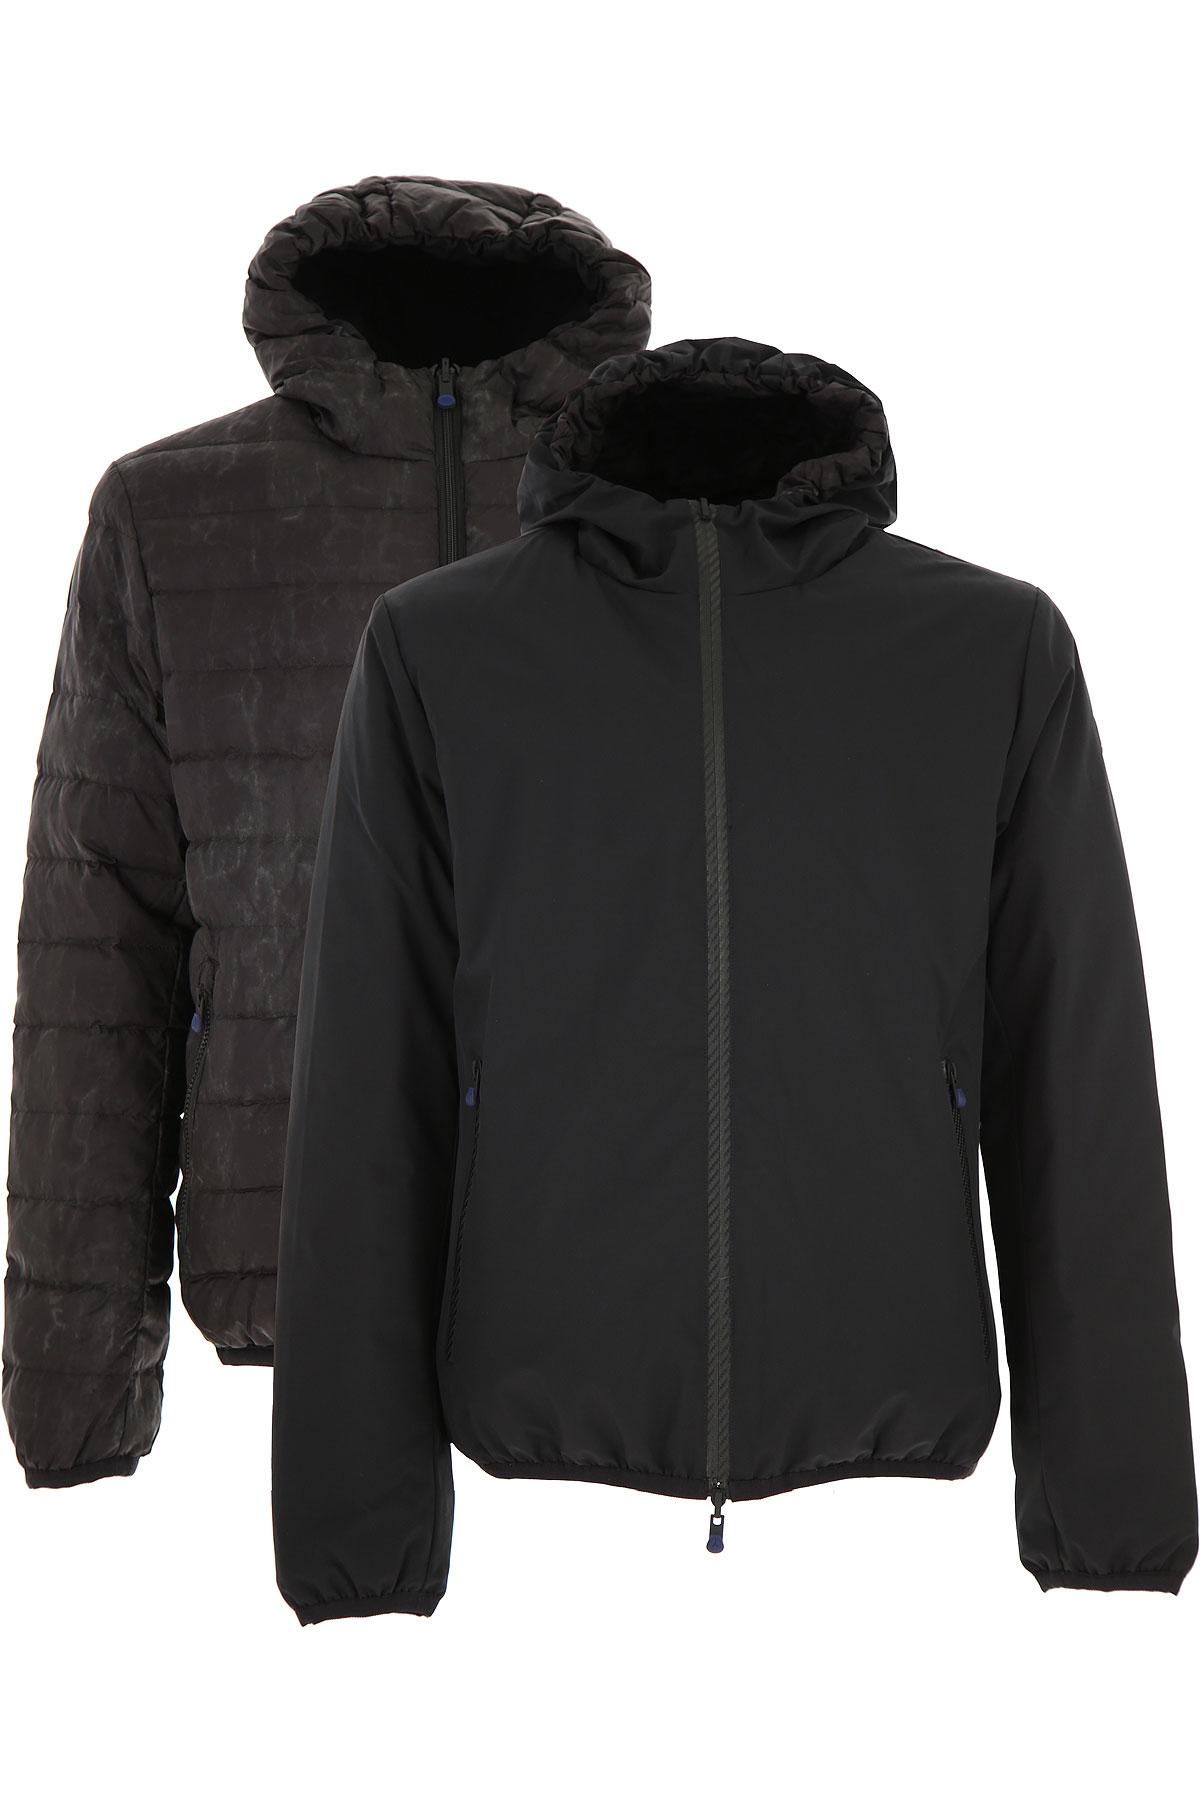 People of Shibuya Down Jacket for Men, Puffer Ski Jacket On Sale, Black, polyester, 2019, L M XL